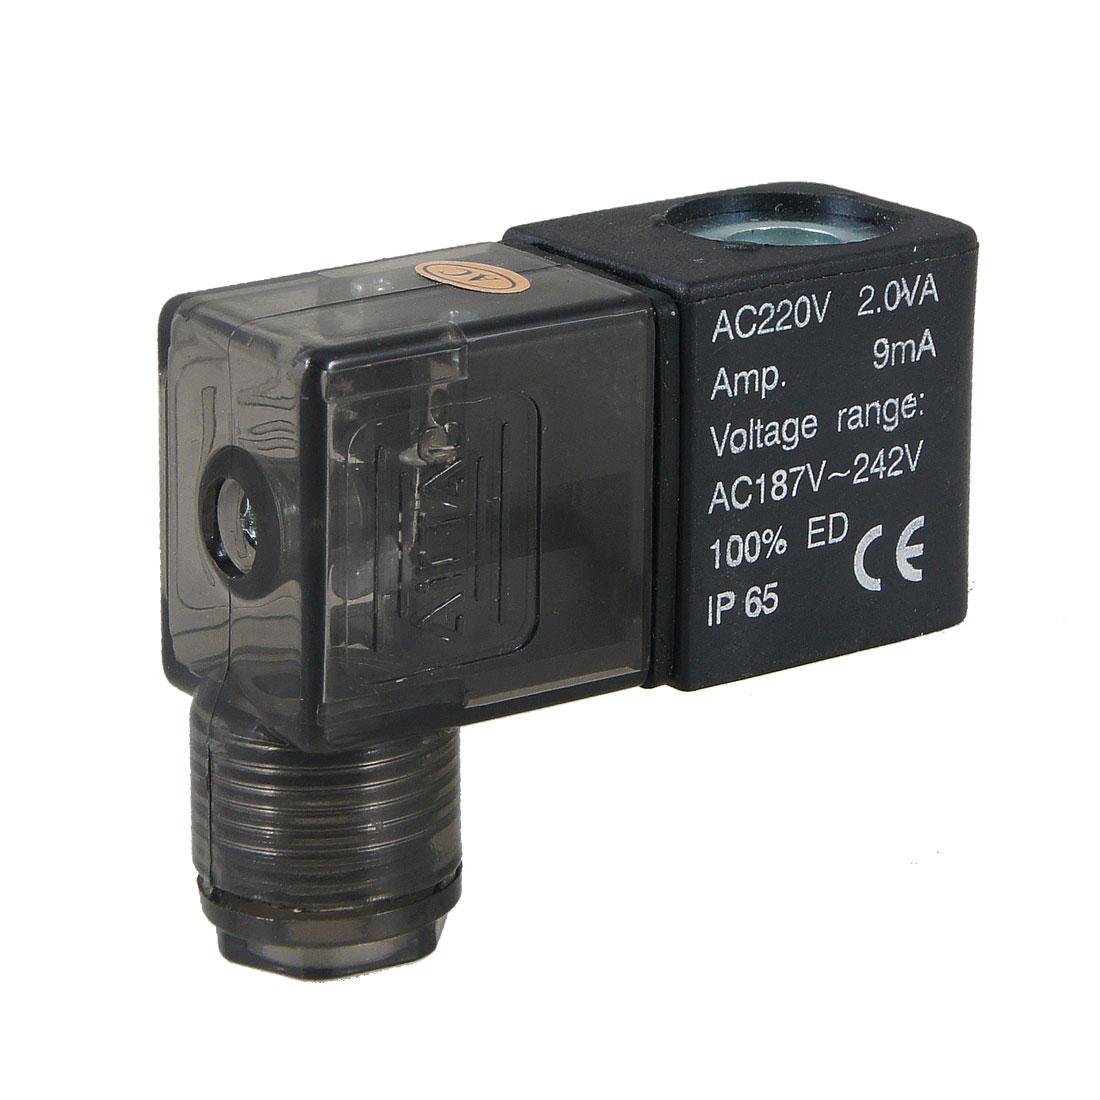 Black Plastic Shell AC 220V 2.0VA Pneumatic Control Solenoid Valve Coil